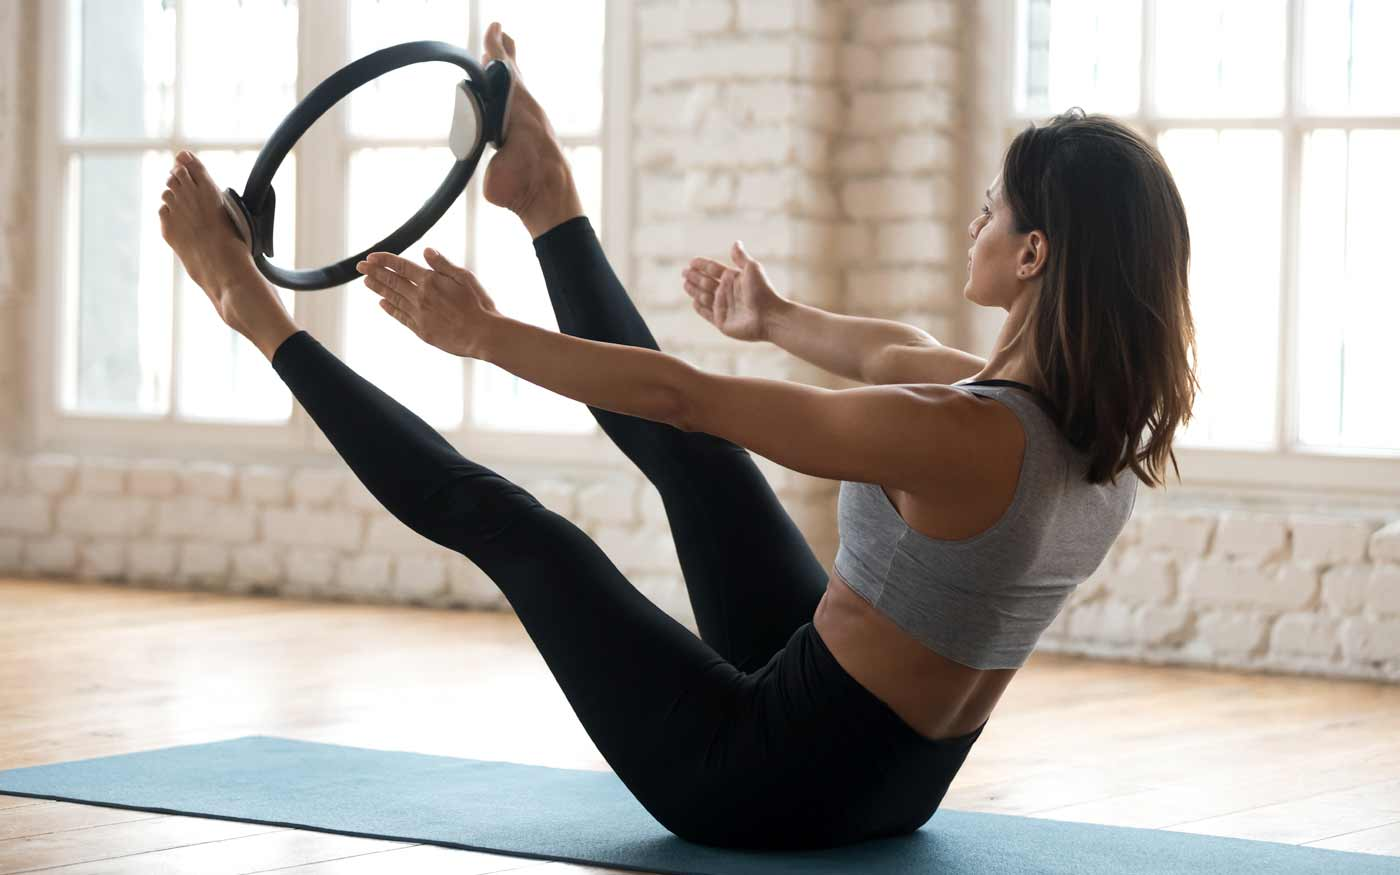 website design for fitness & wellness businesses